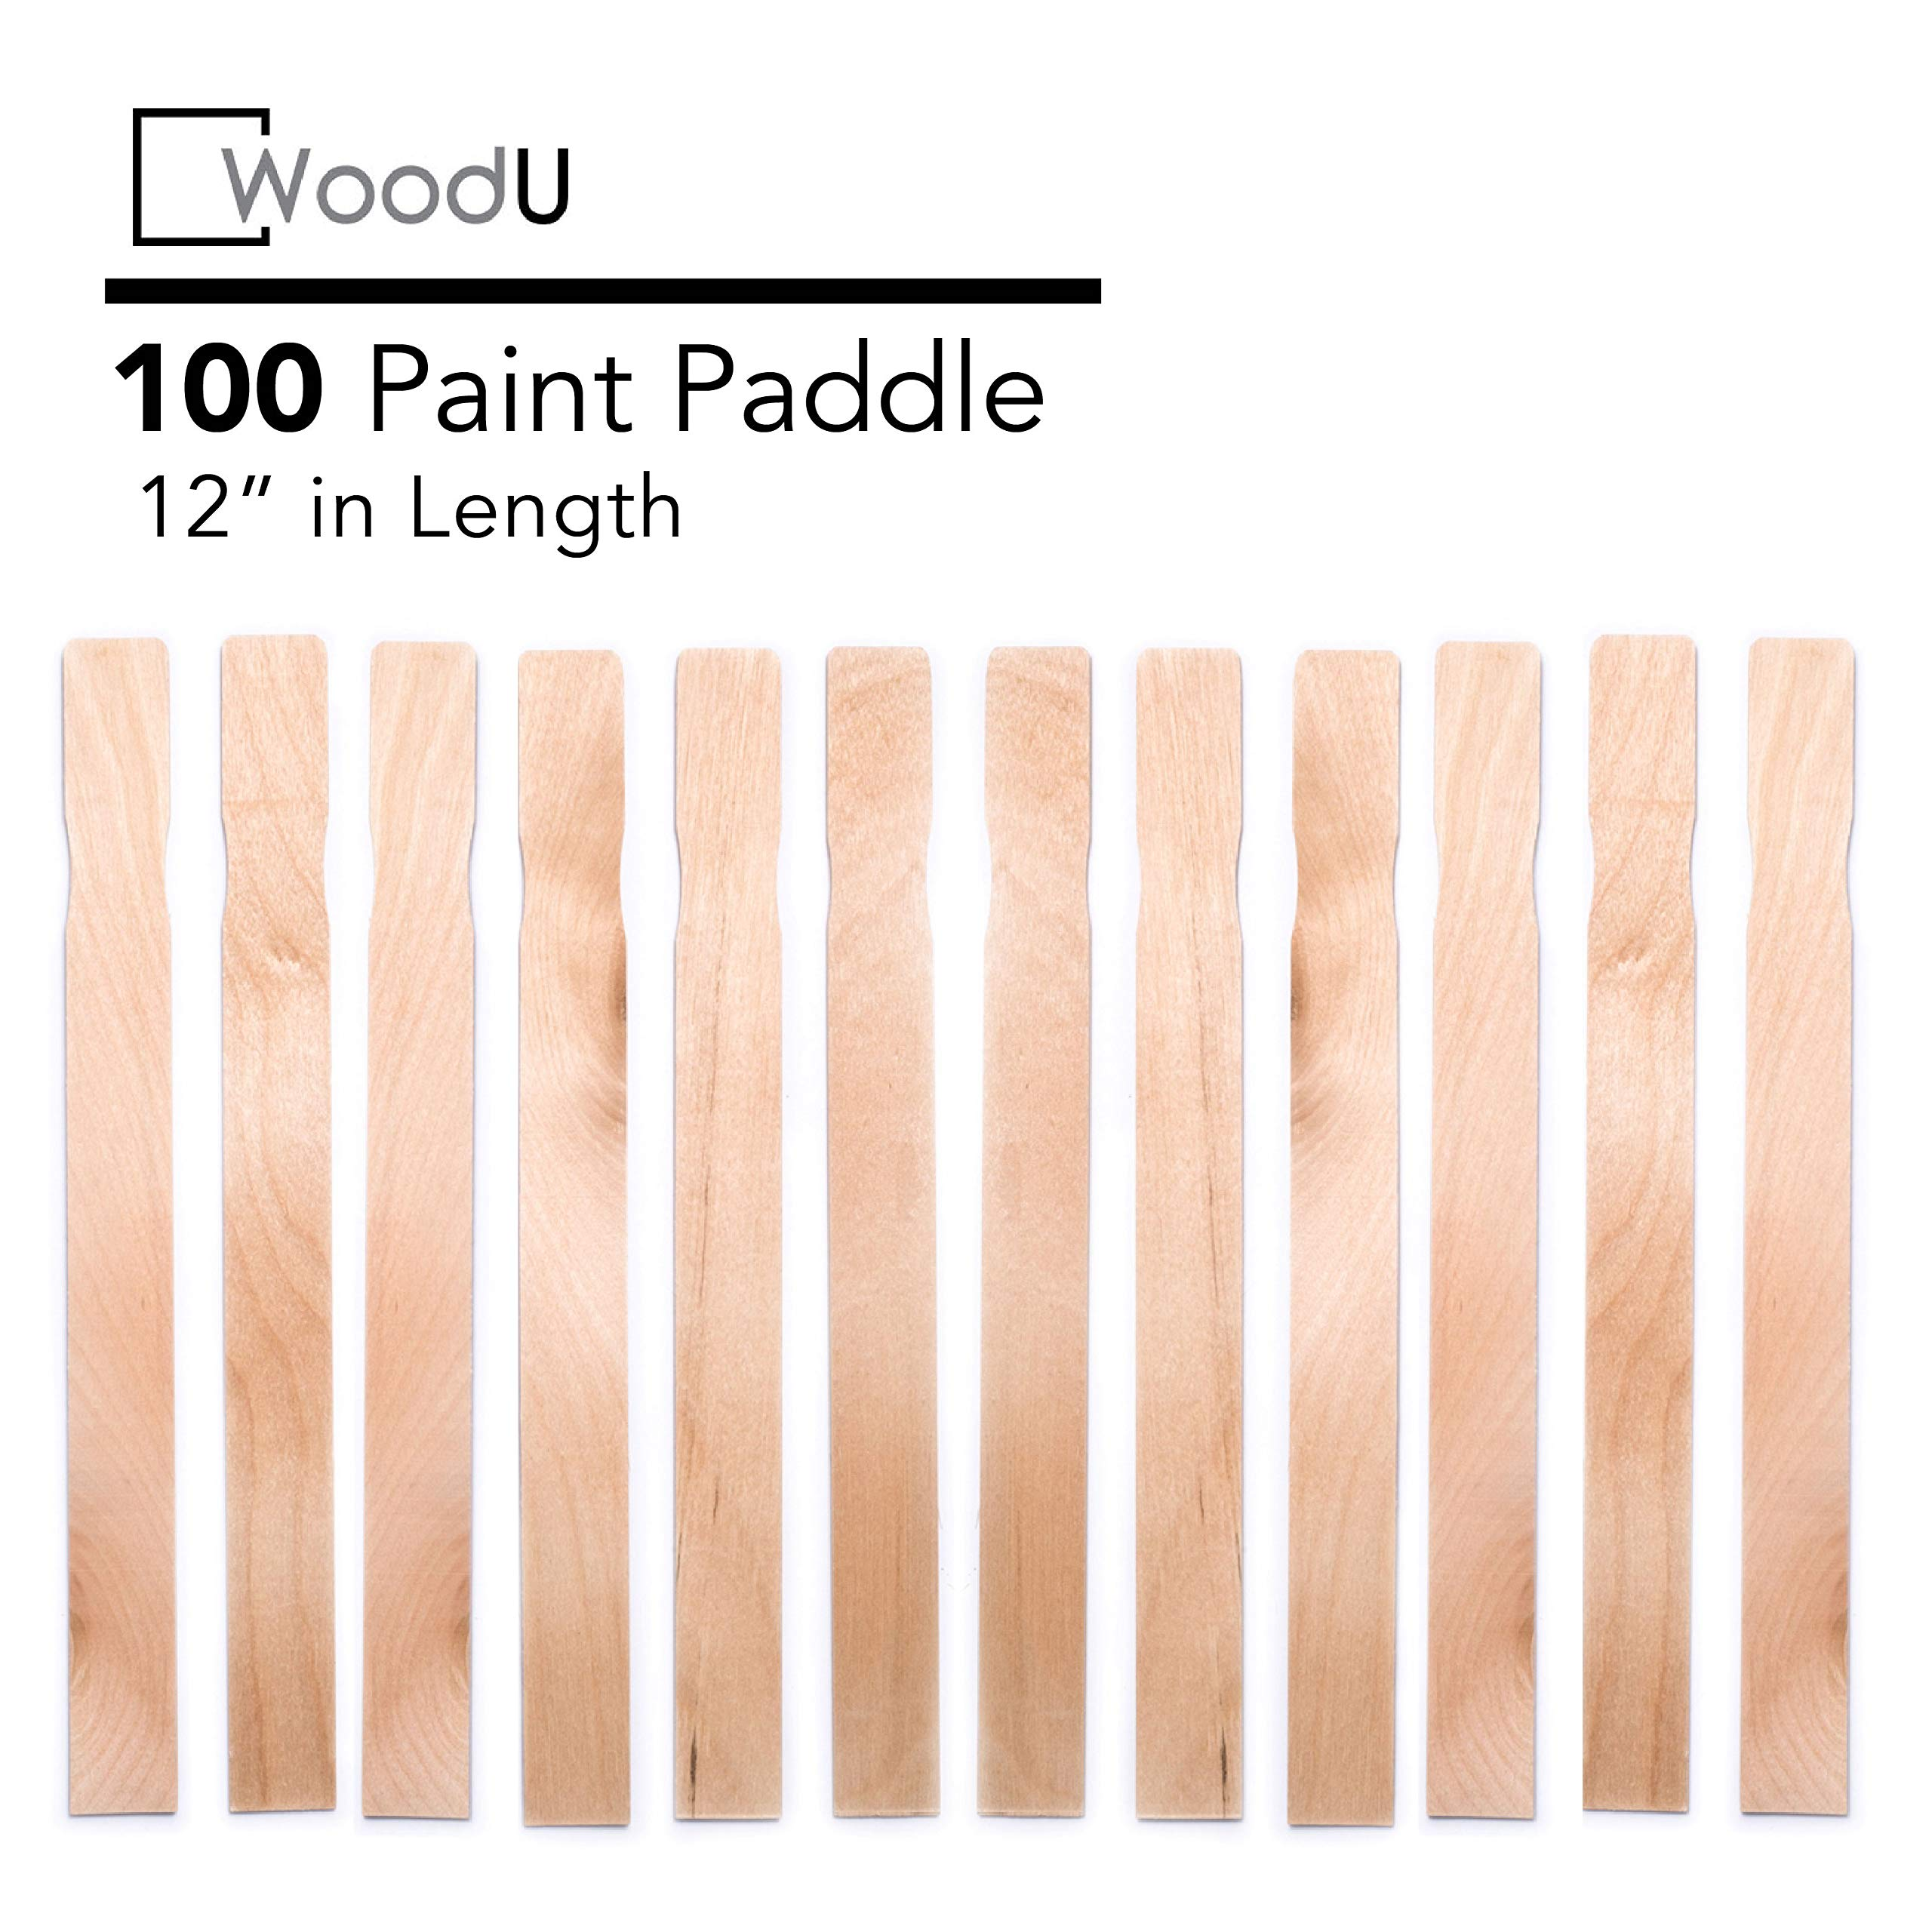 Wooden Paint Stir Sticks 12'' Bulk Pack 100pc, DIY Paint Paddles for Mixing Paint and Other Liquids by WoodU